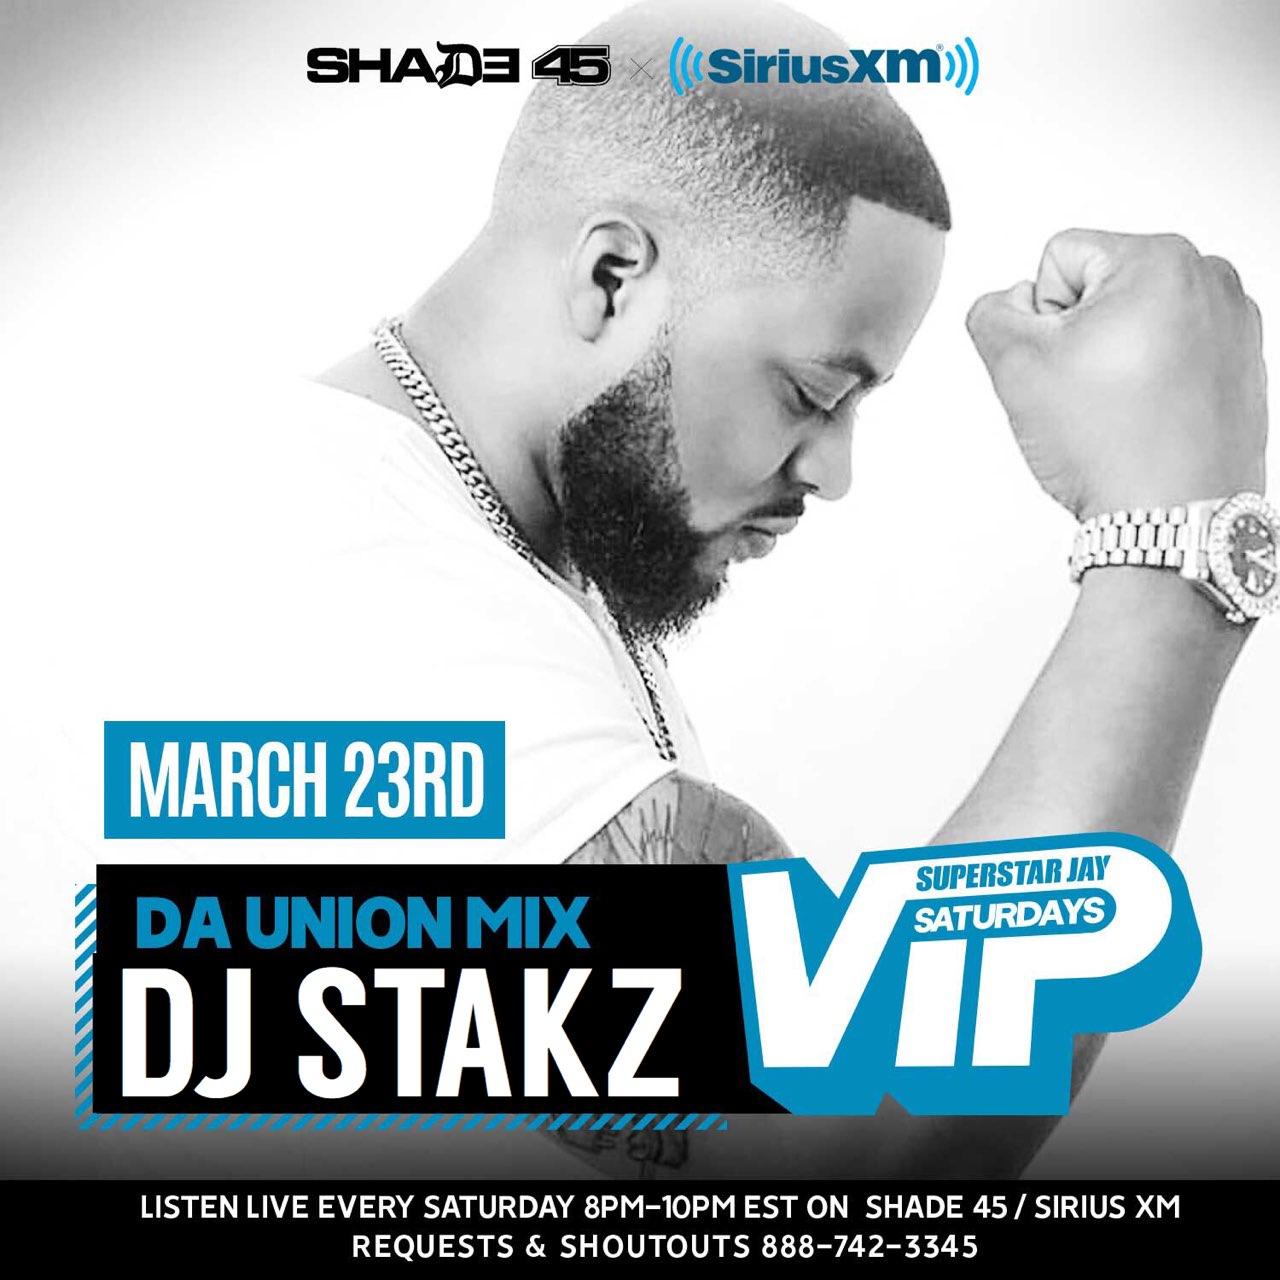 VIP Saturdays - Stakz - March 23.jpg